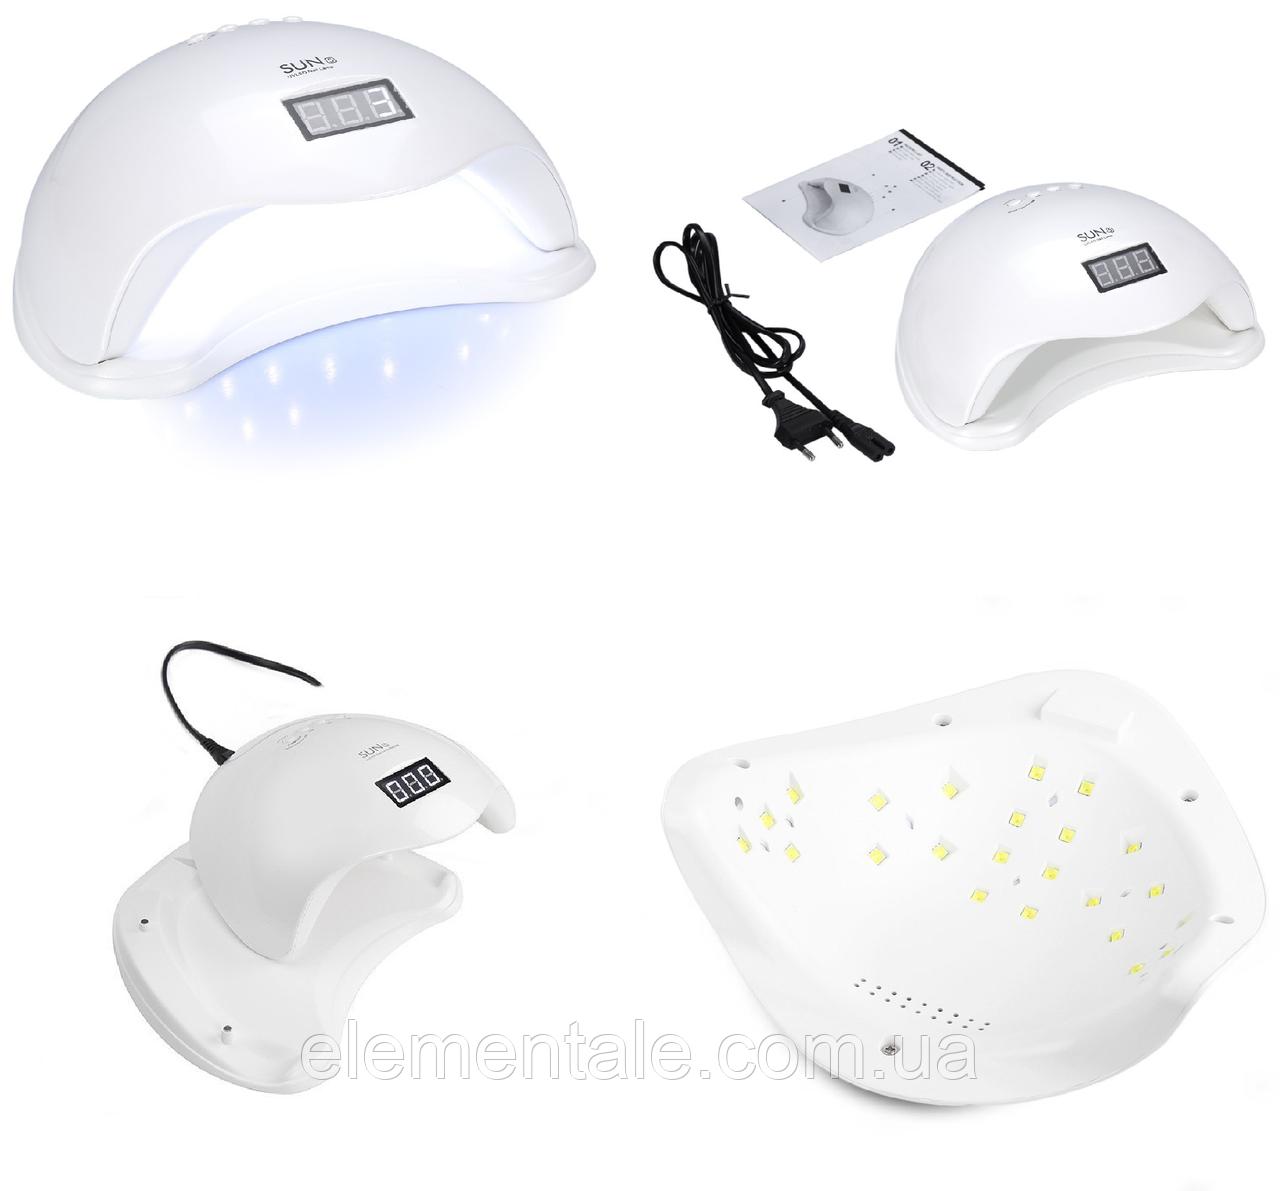 Ультрафиолетовая лампа для ногтей SUN 5 48 Вт Белый